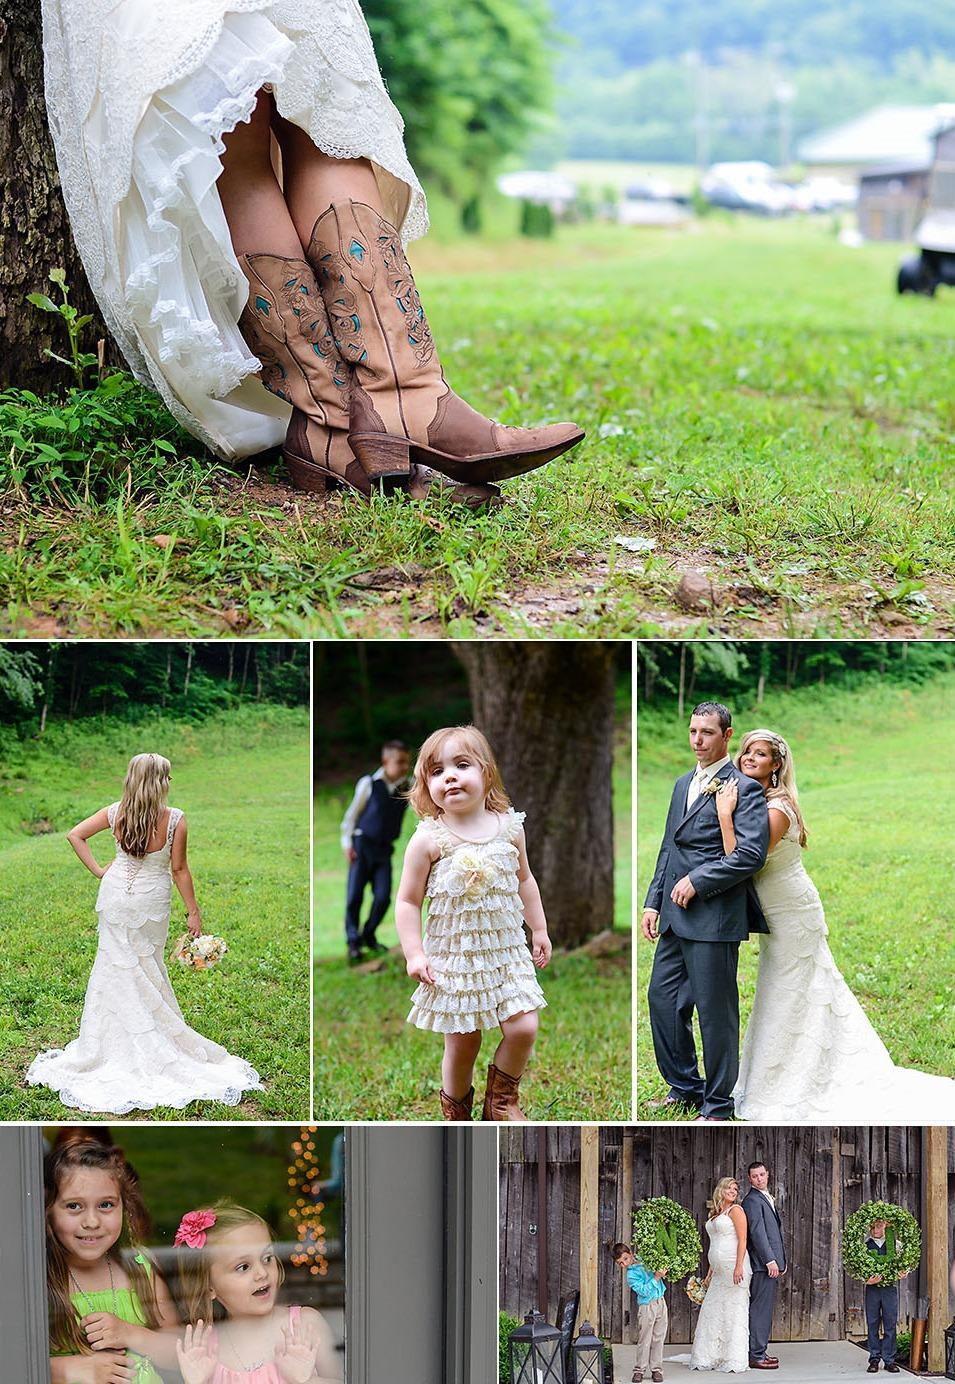 h wedding party2